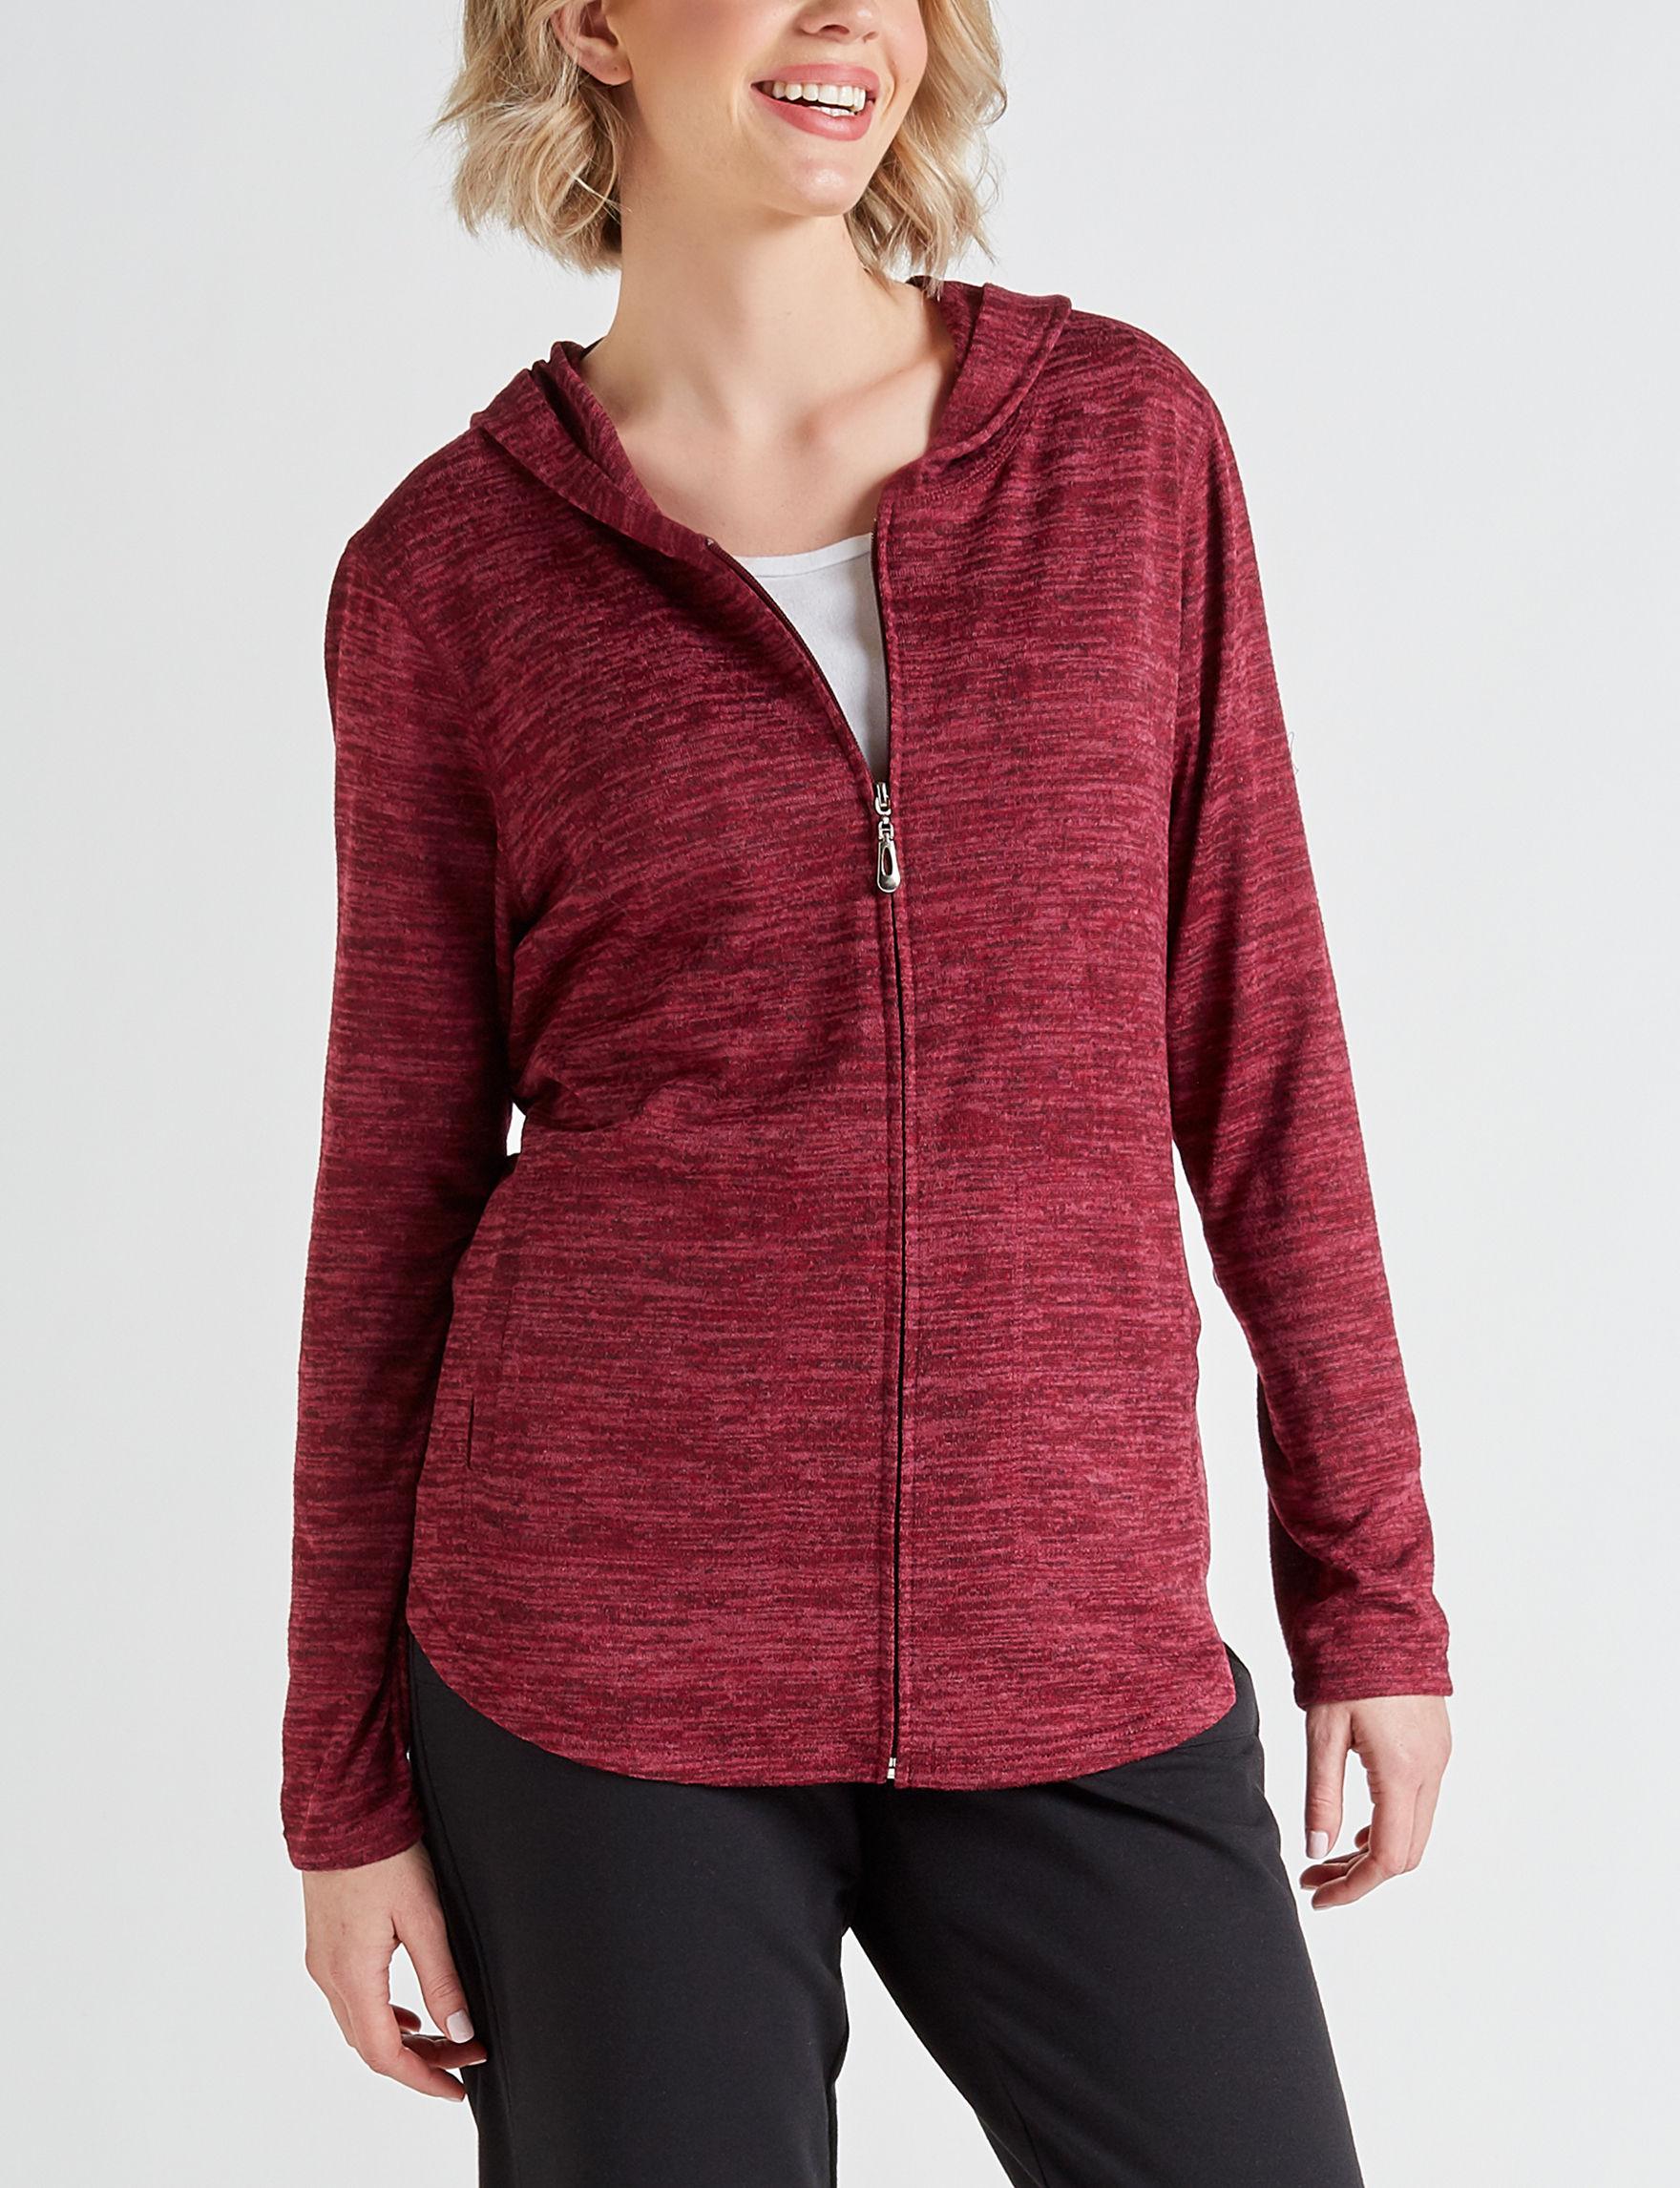 Cathy Daniels Burgundy Lightweight Jackets & Blazers Shirts & Blouses